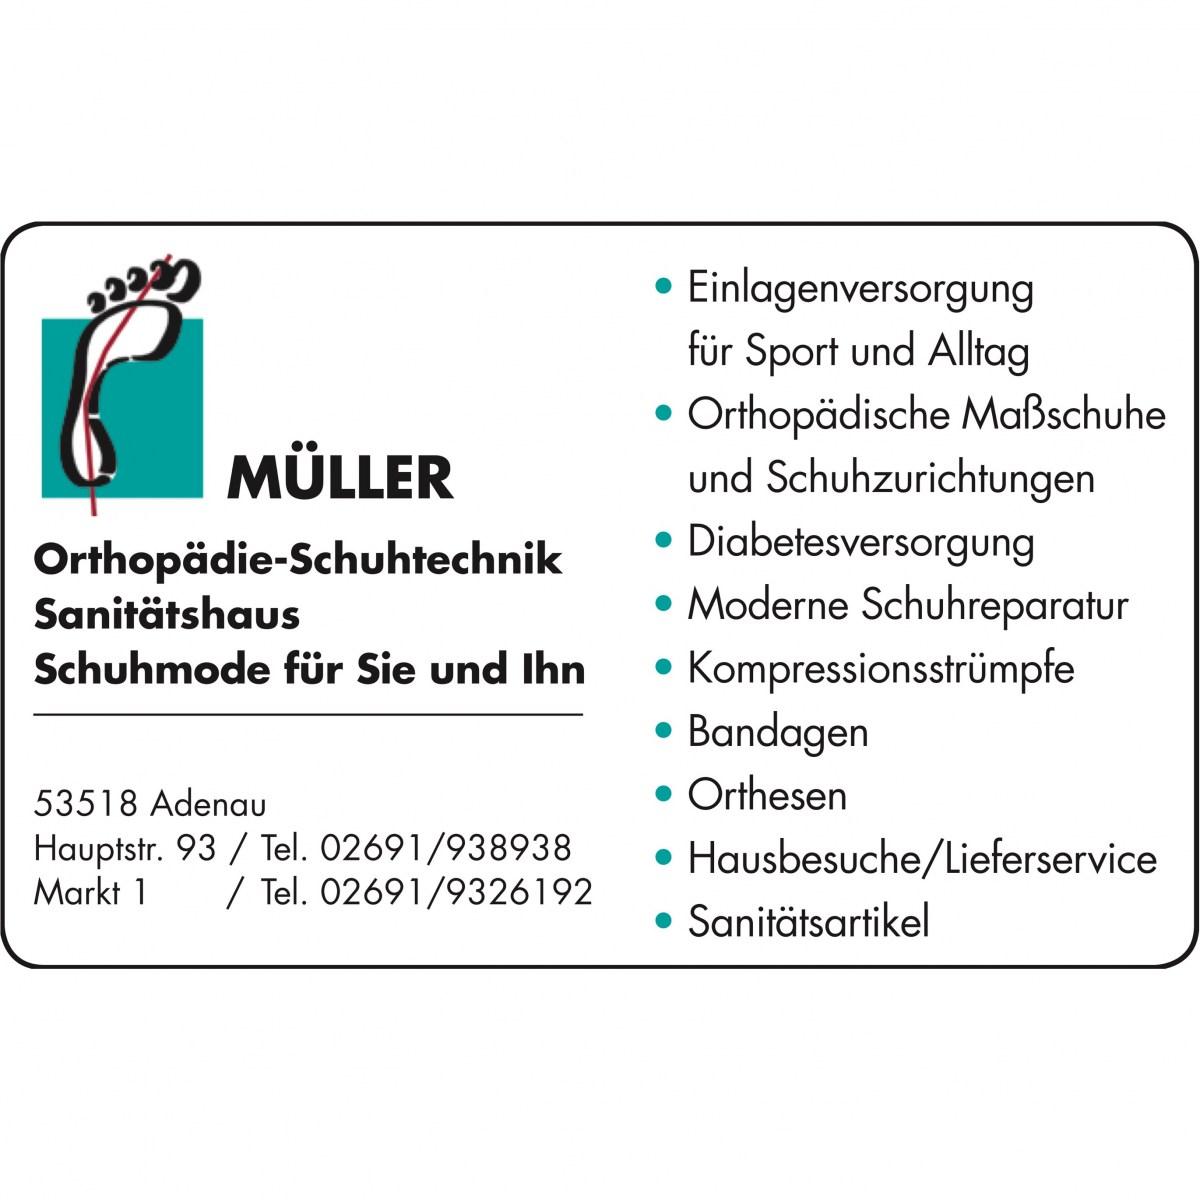 orthopaedie-schuhtechnik-mueller